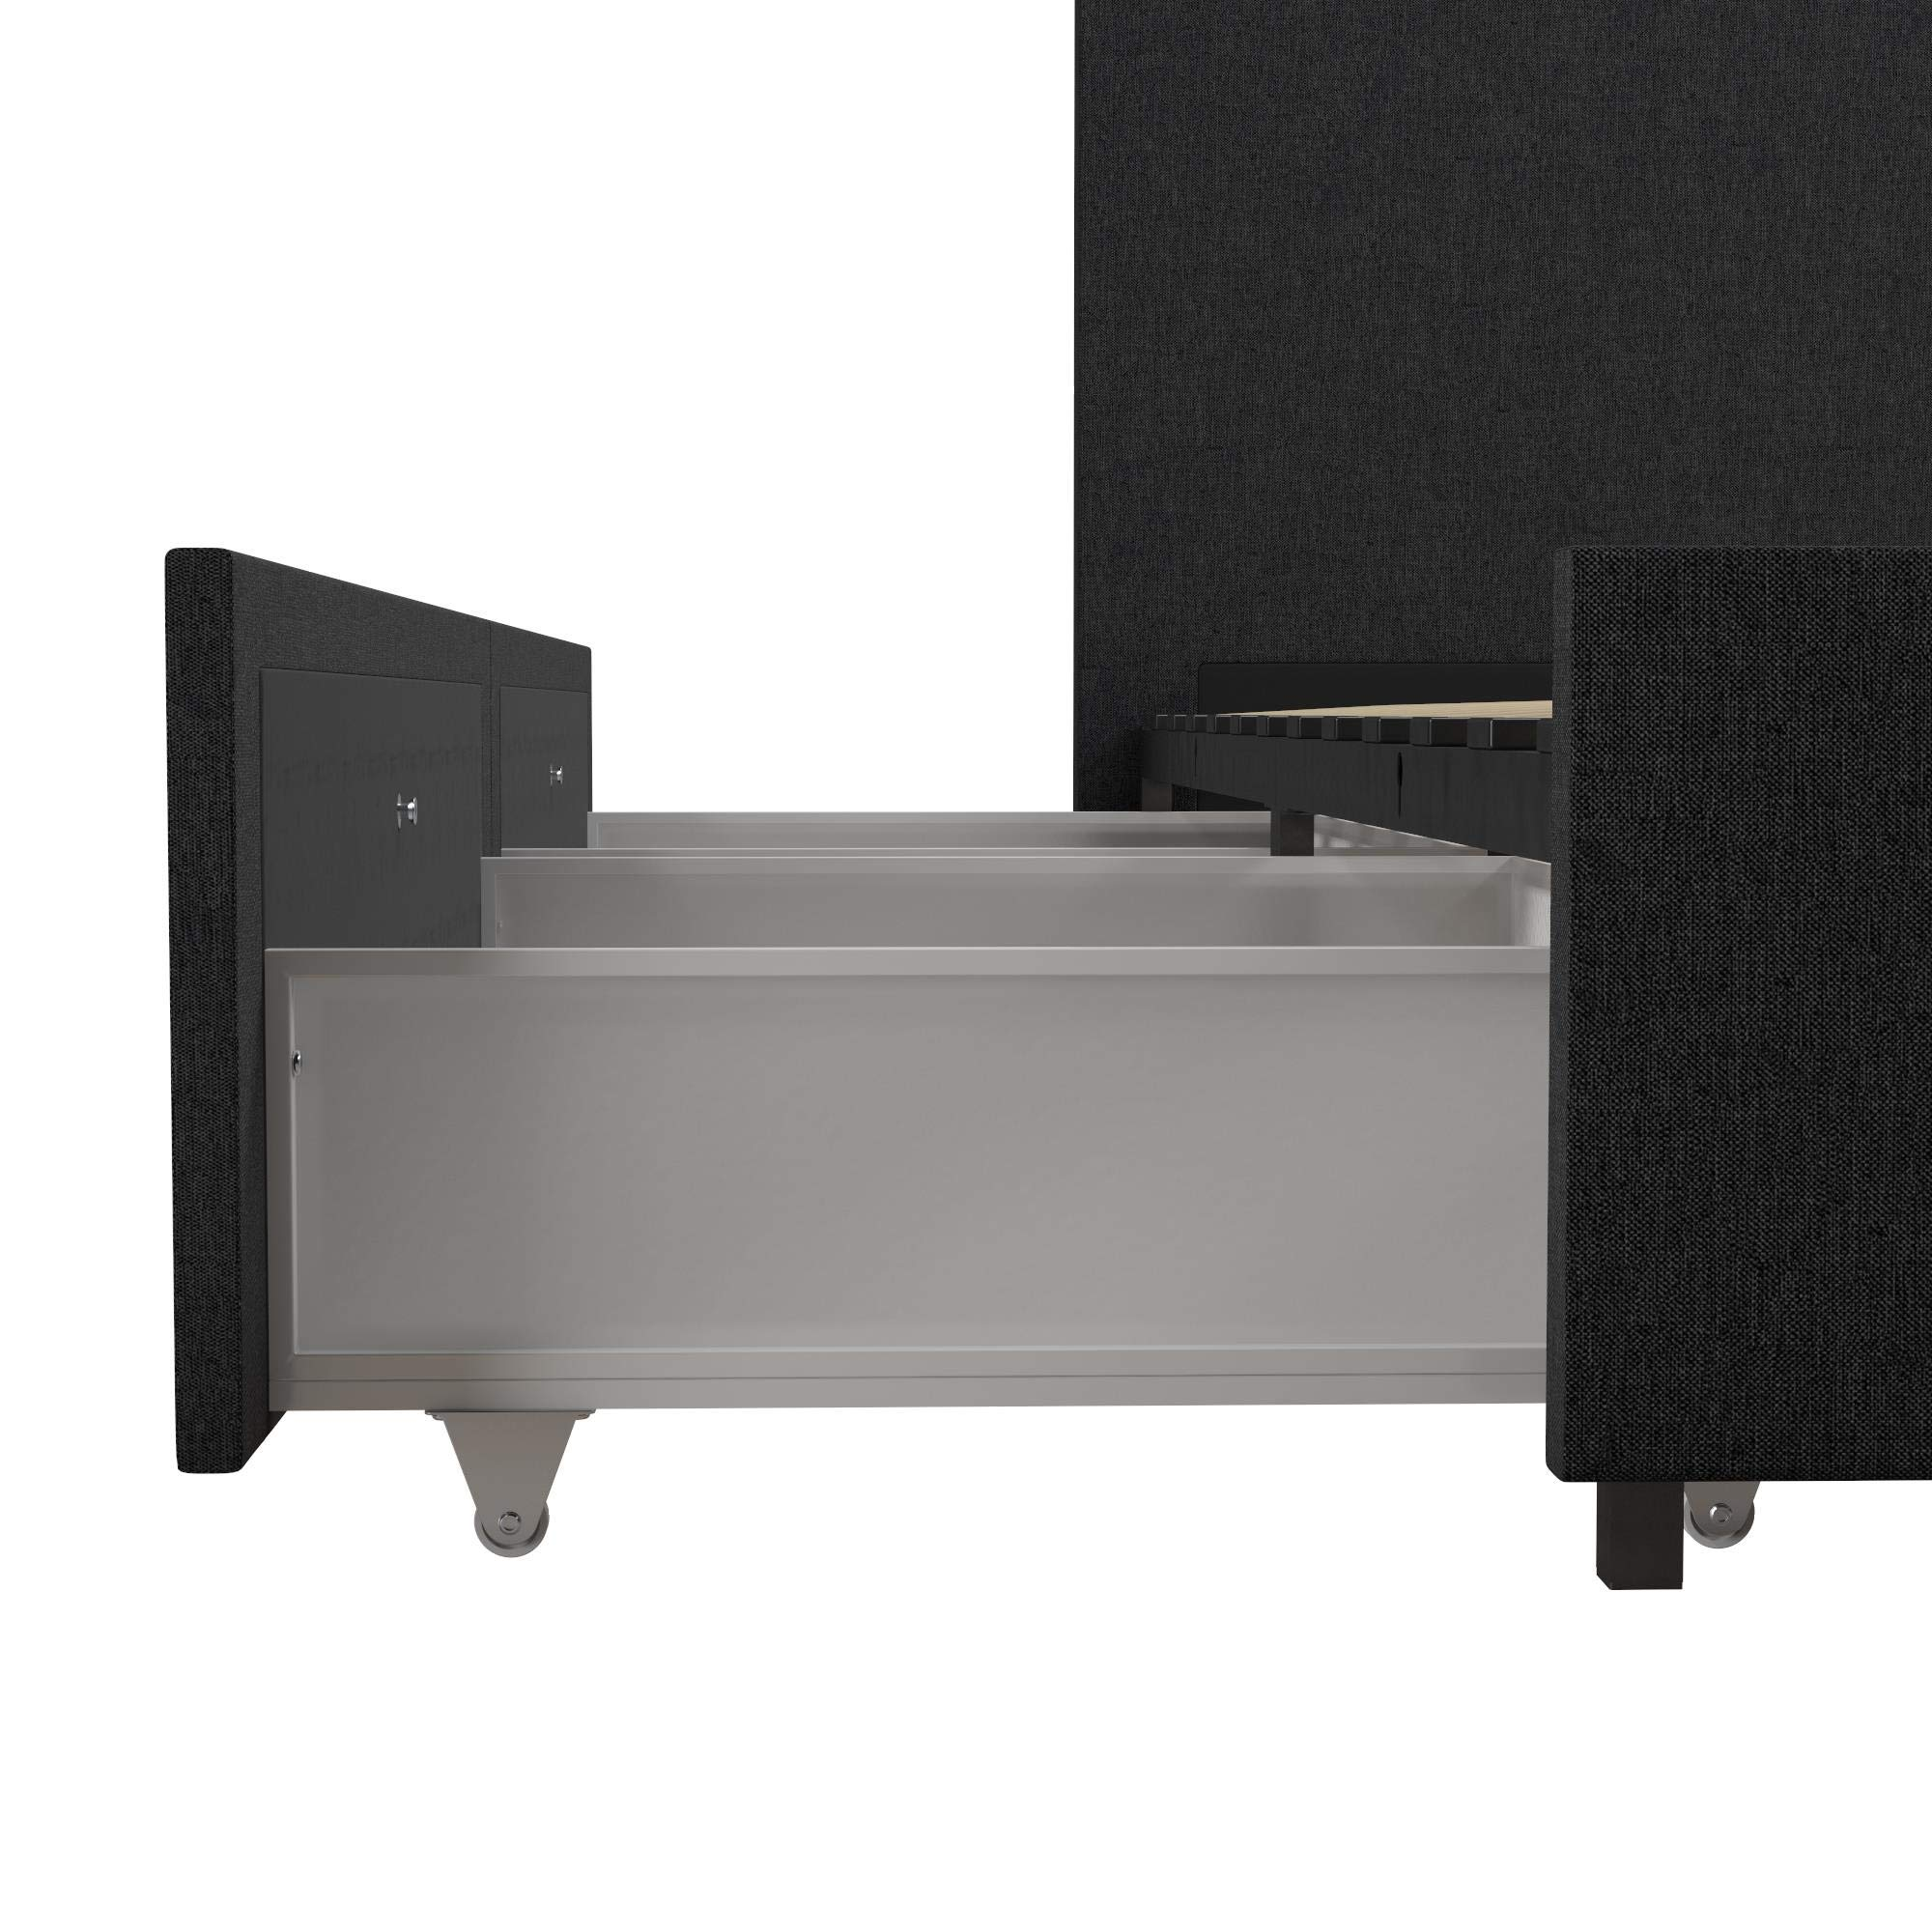 Novogratz Kelly Bed with Storage, Queen, Dark Gray Linen by Novogratz (Image #8)